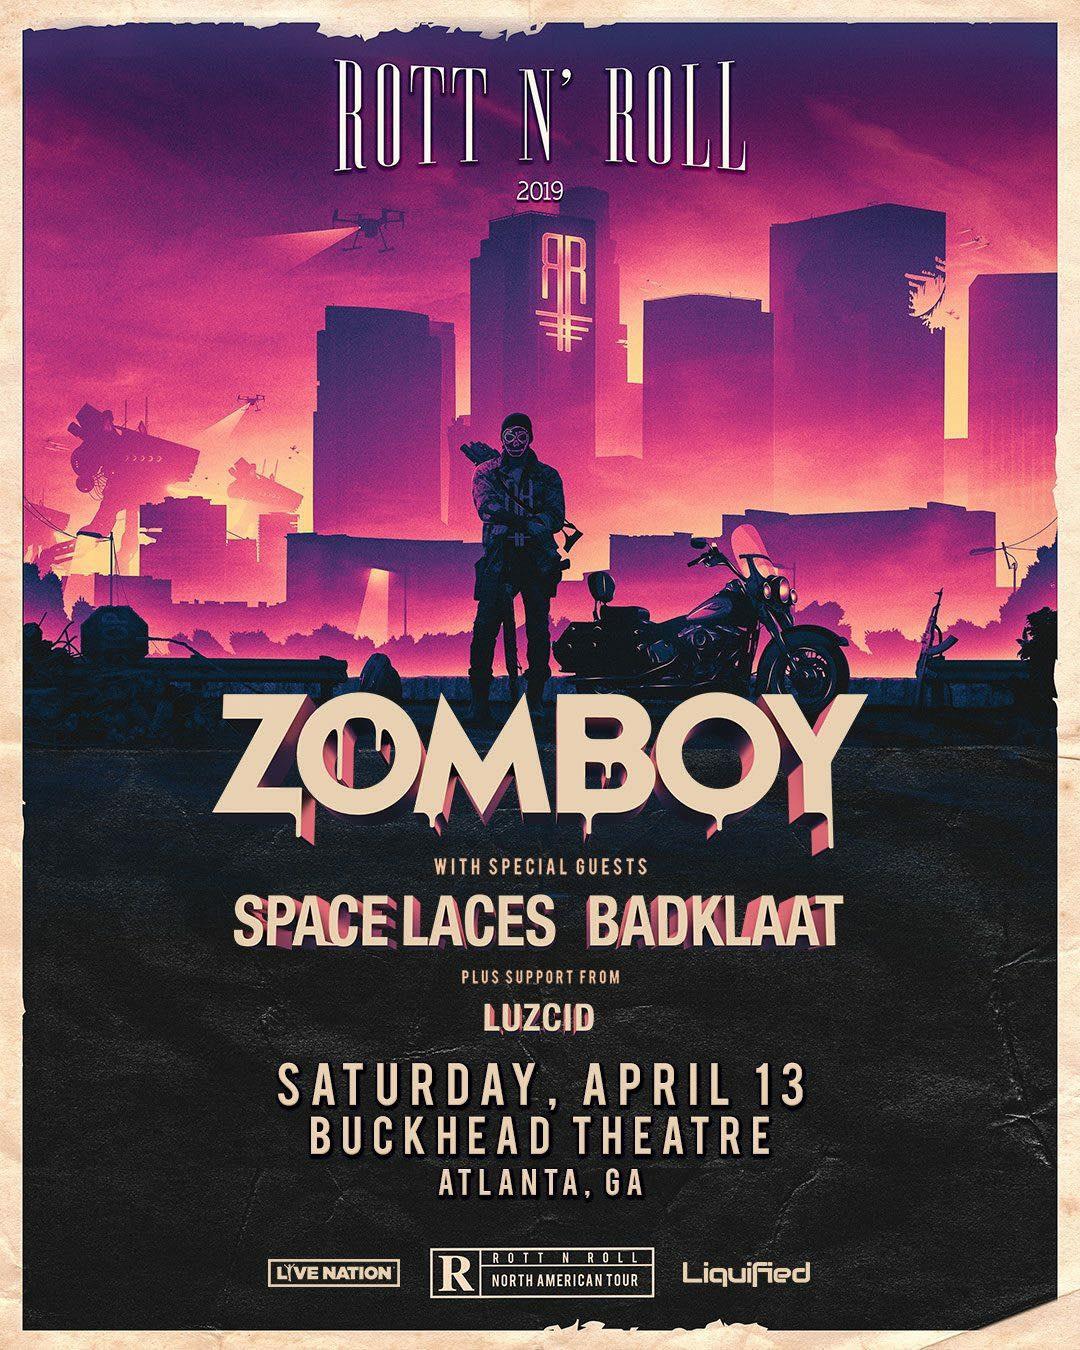 Zomboy Space Laces Badklaat Buckhead Theatre Atlanta EDM.jpg